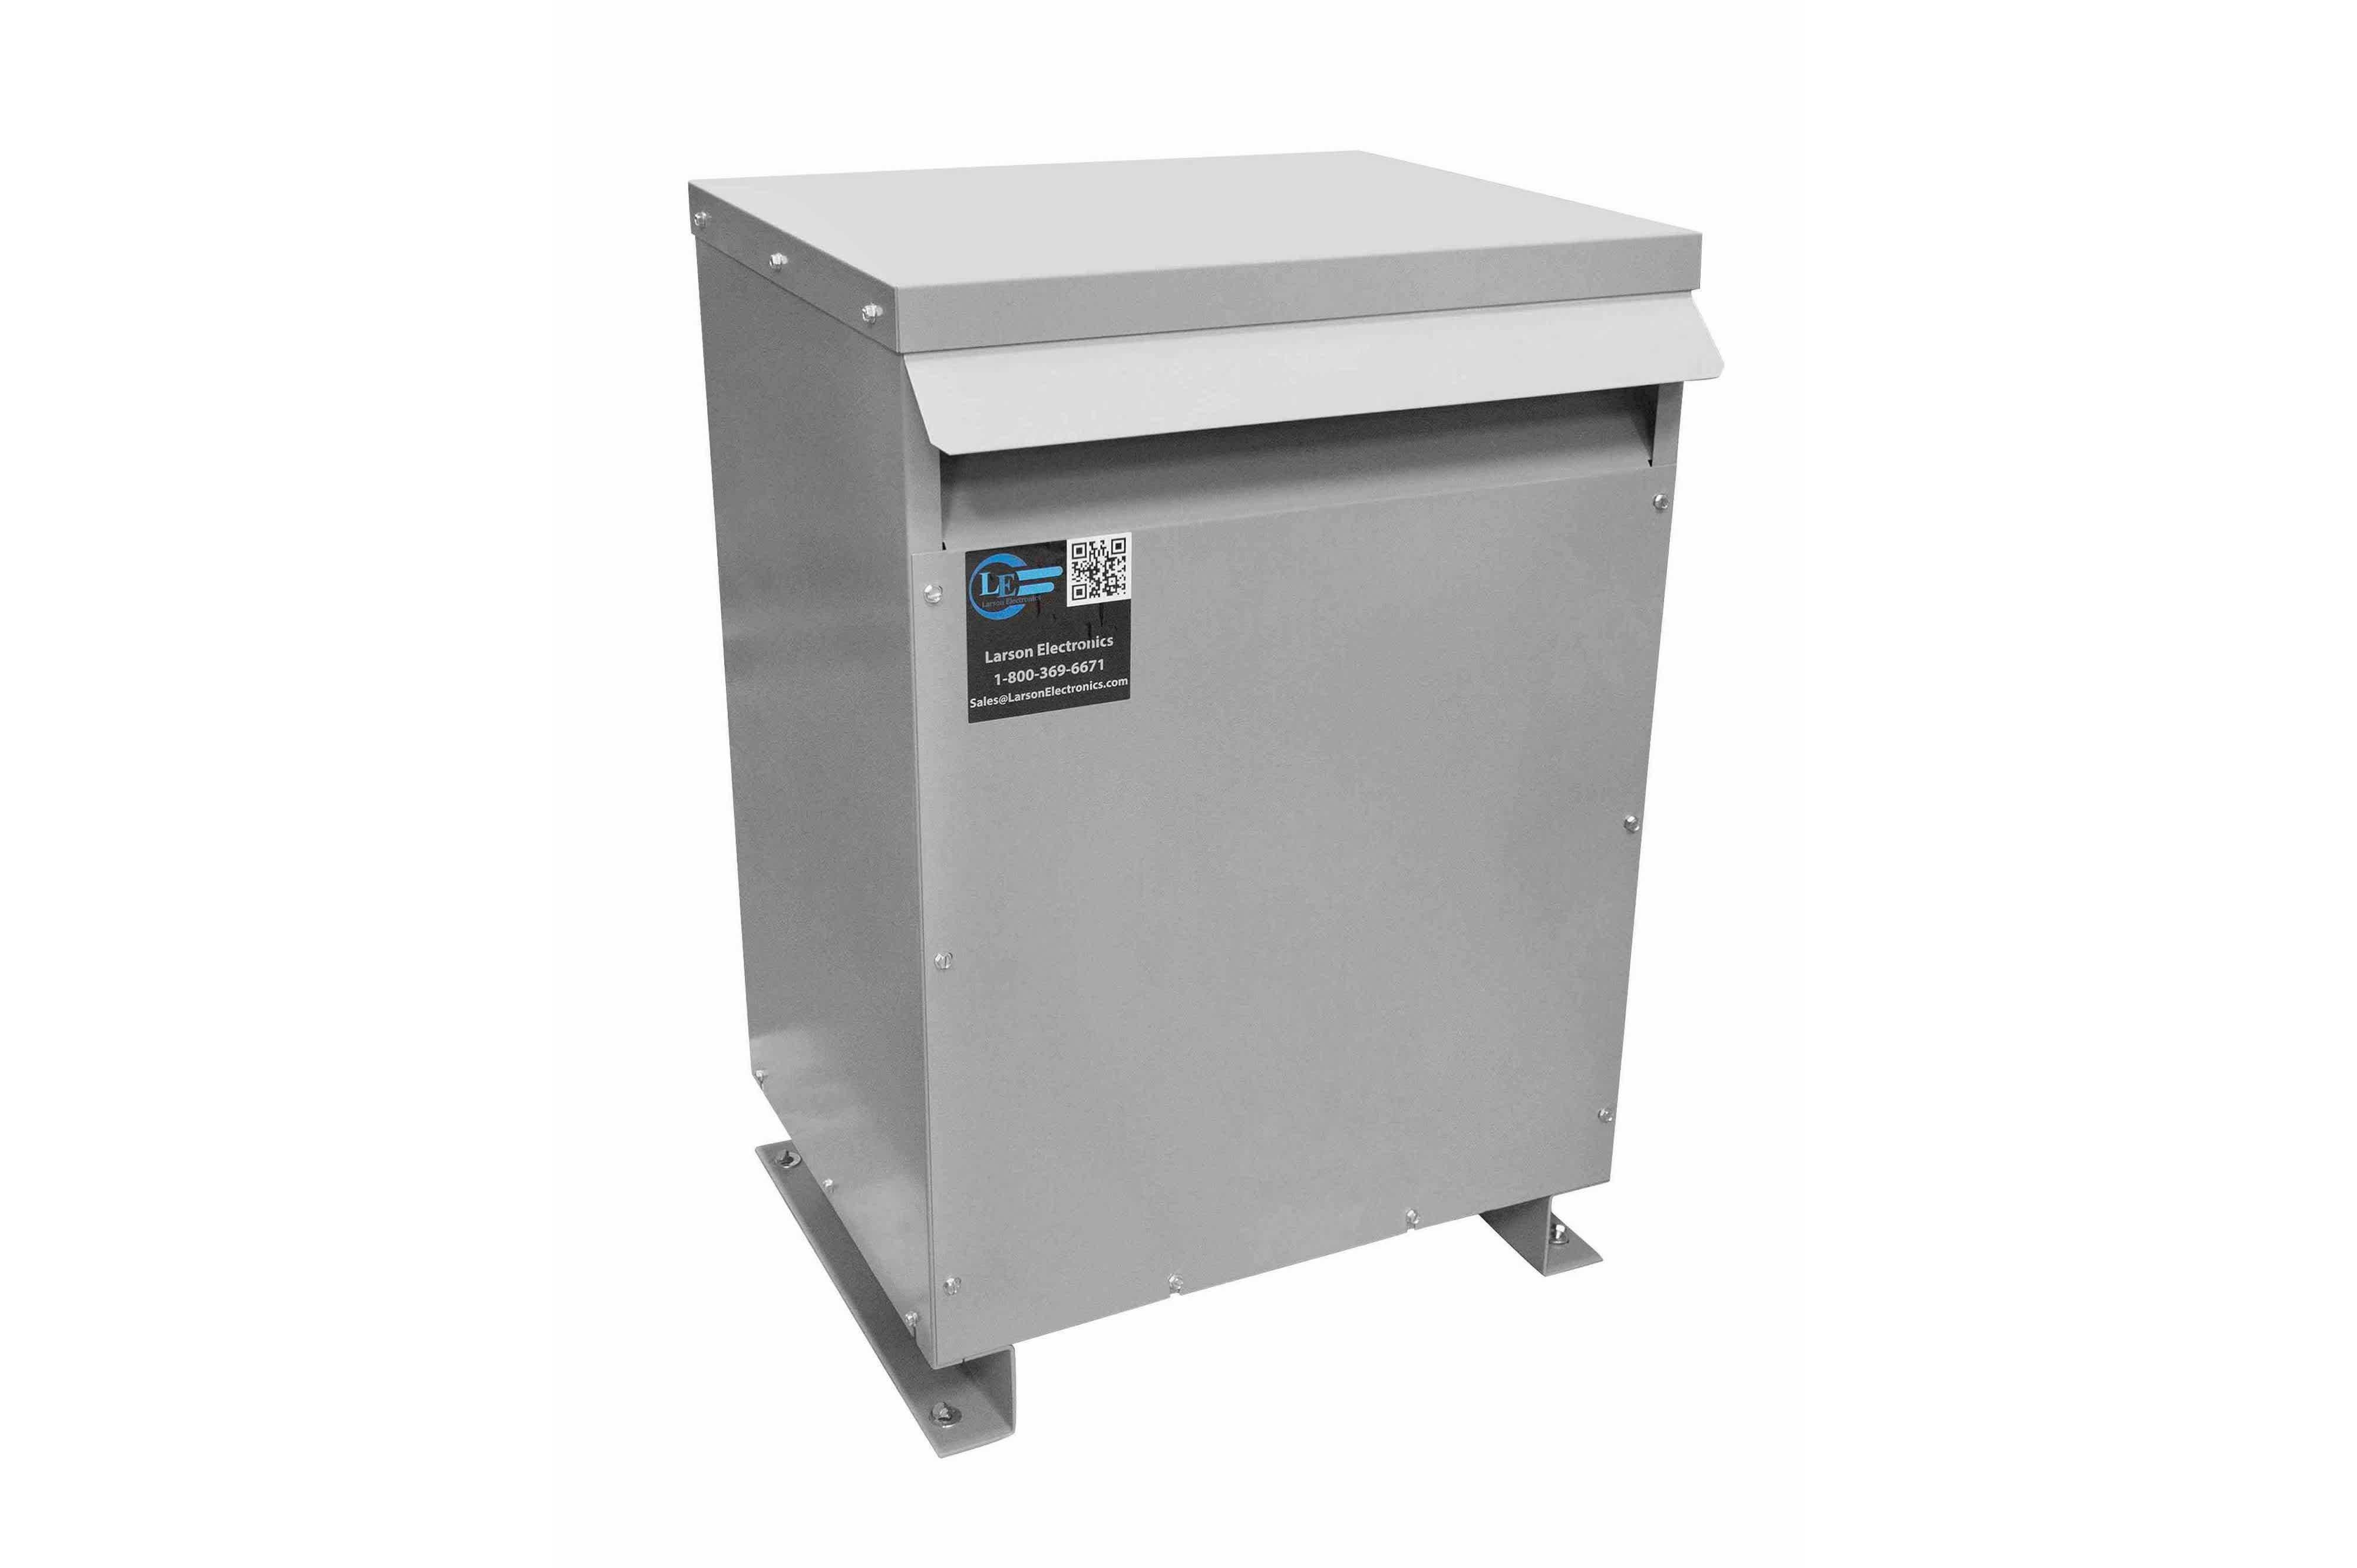 27 kVA 3PH Isolation Transformer, 575V Wye Primary, 240V/120 Delta Secondary, N3R, Ventilated, 60 Hz